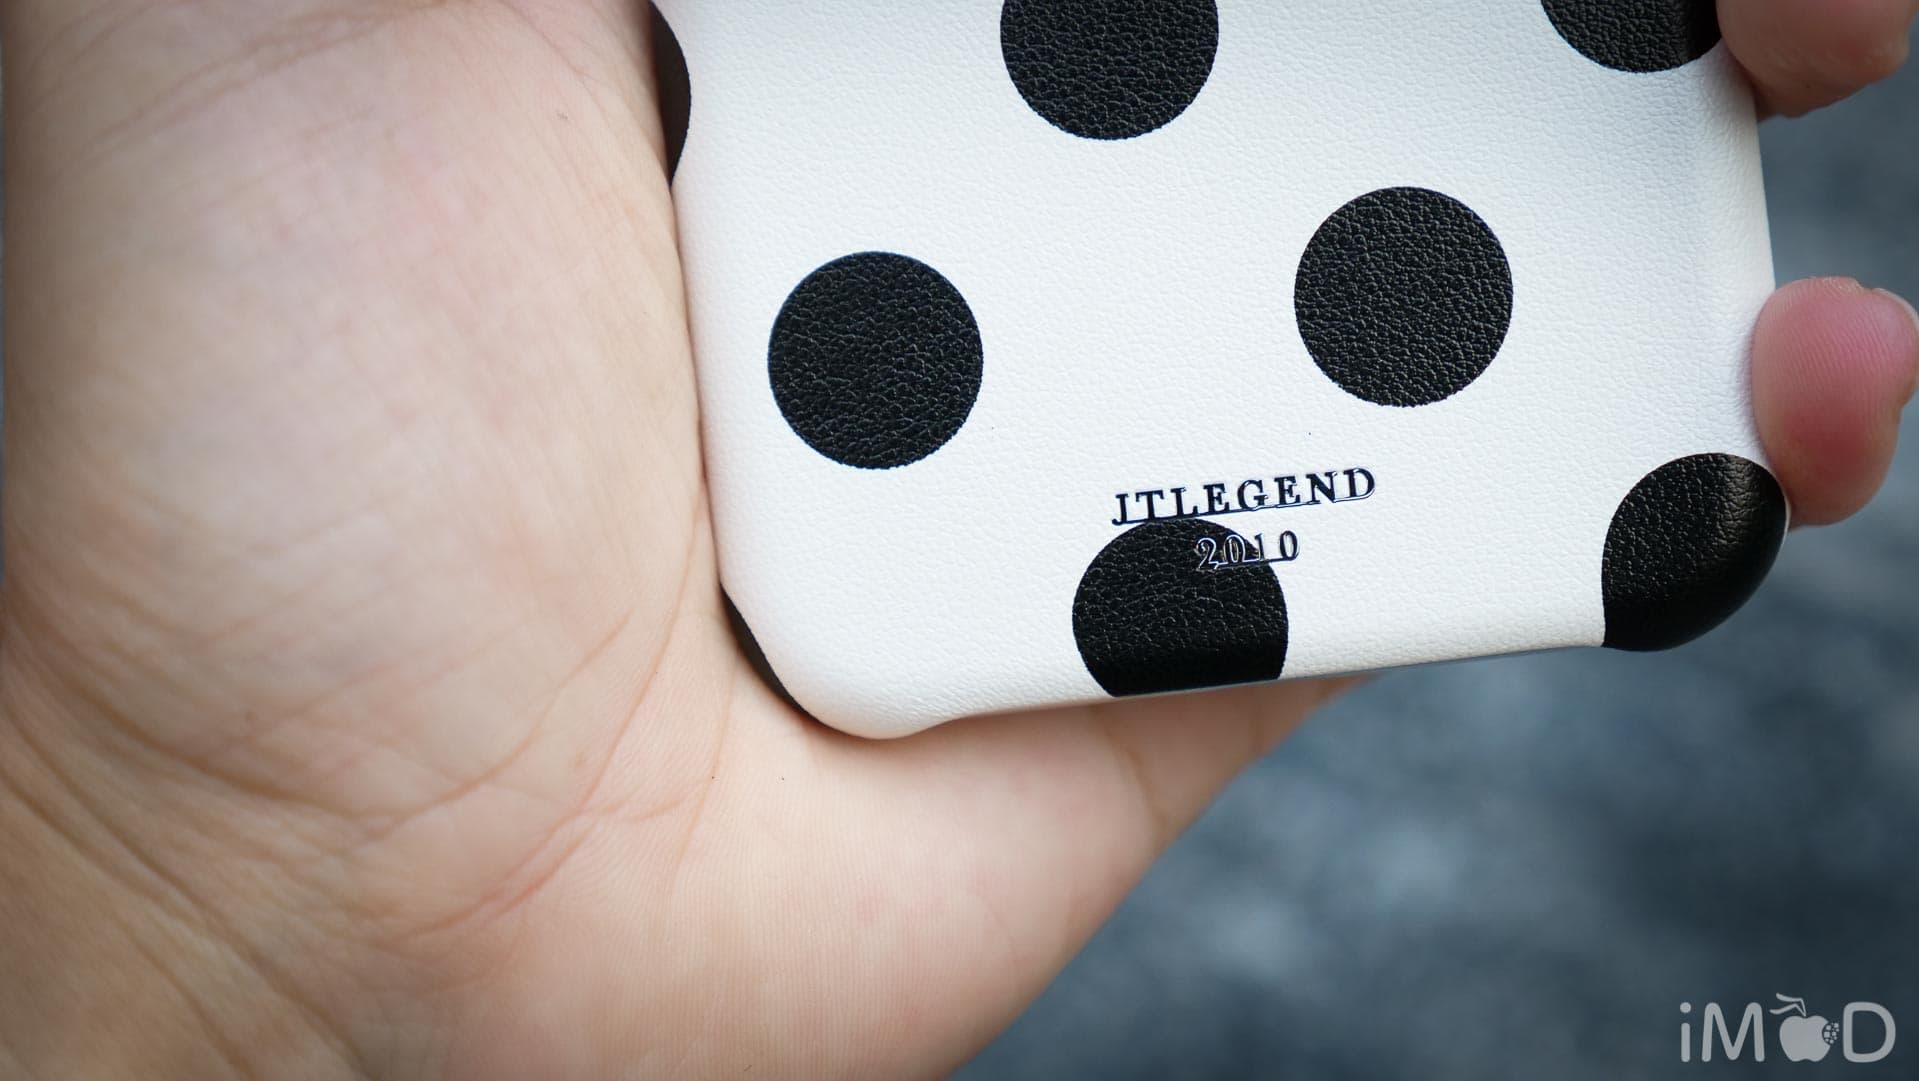 Jtlegend Pokla Leather Case Iphone X 8647